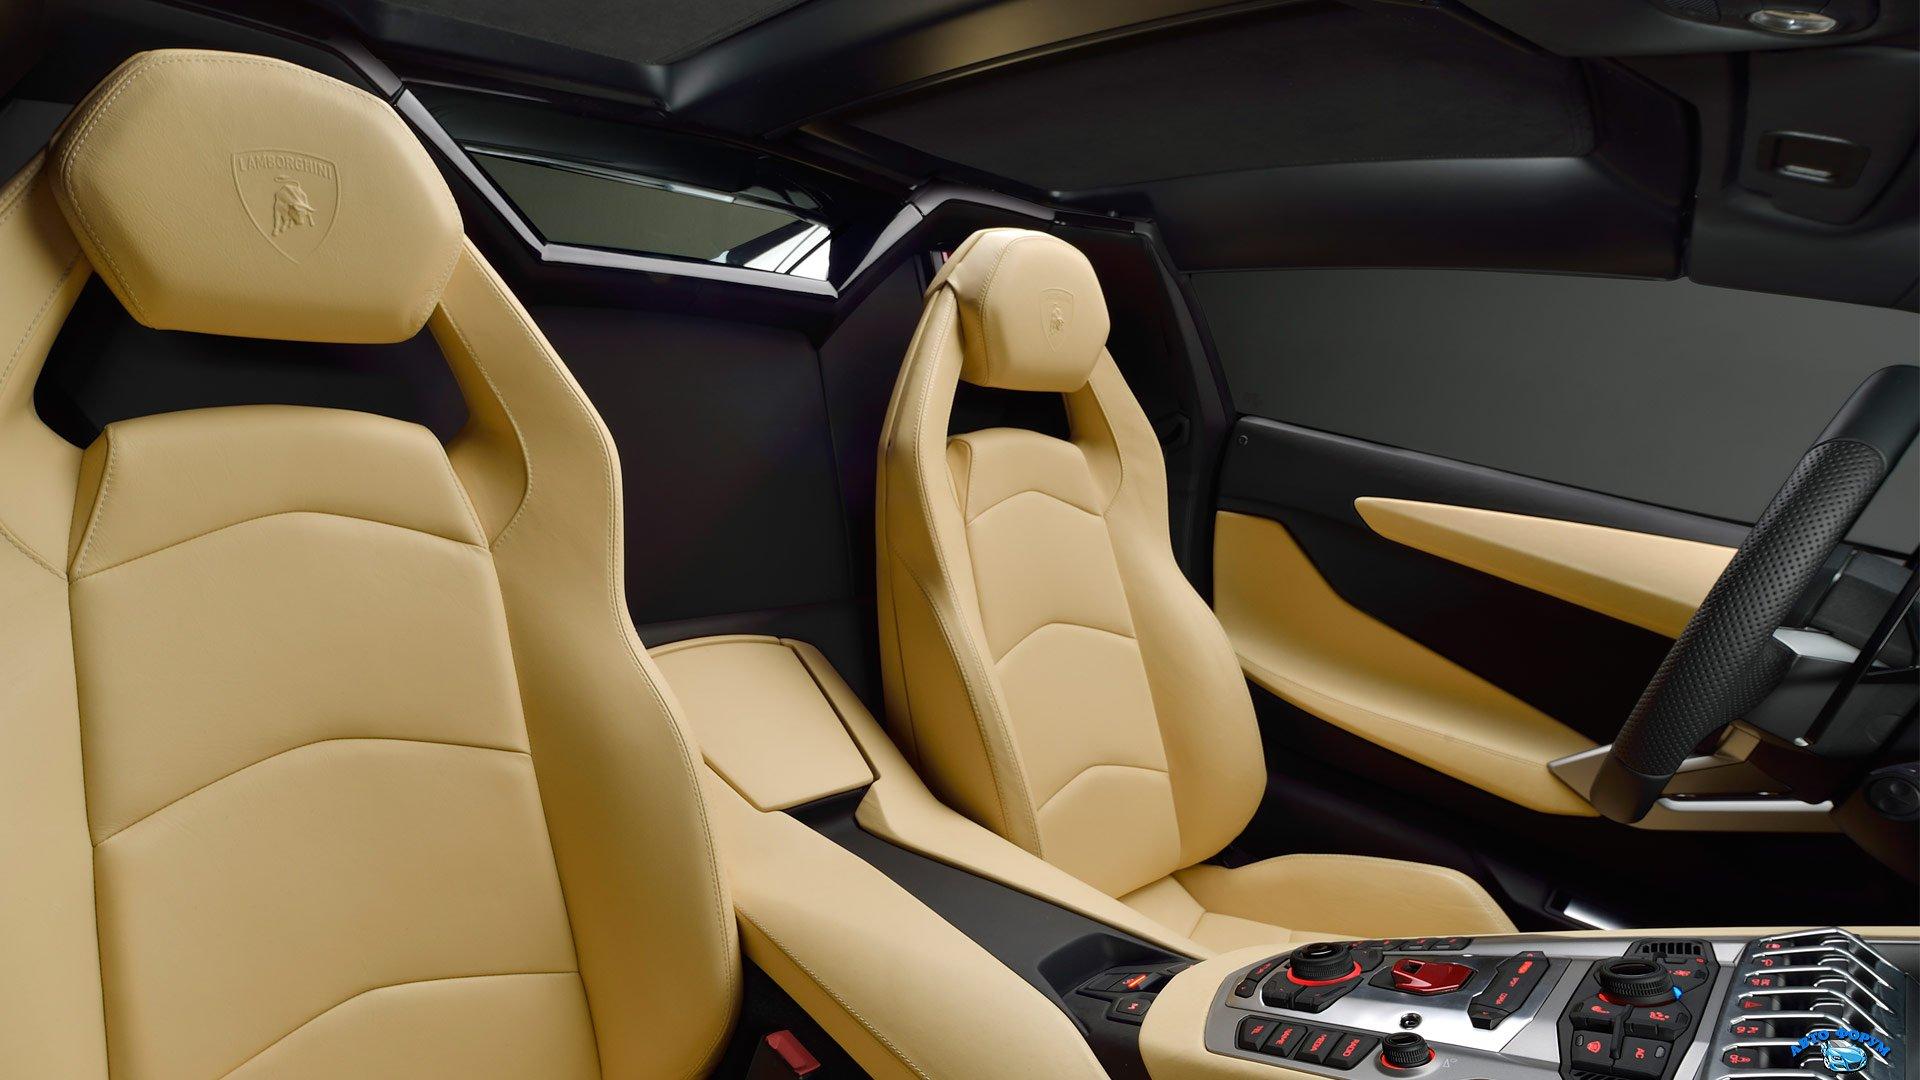 lamborghini_aventador_lp_700-4_roadster_interior_27.jpg